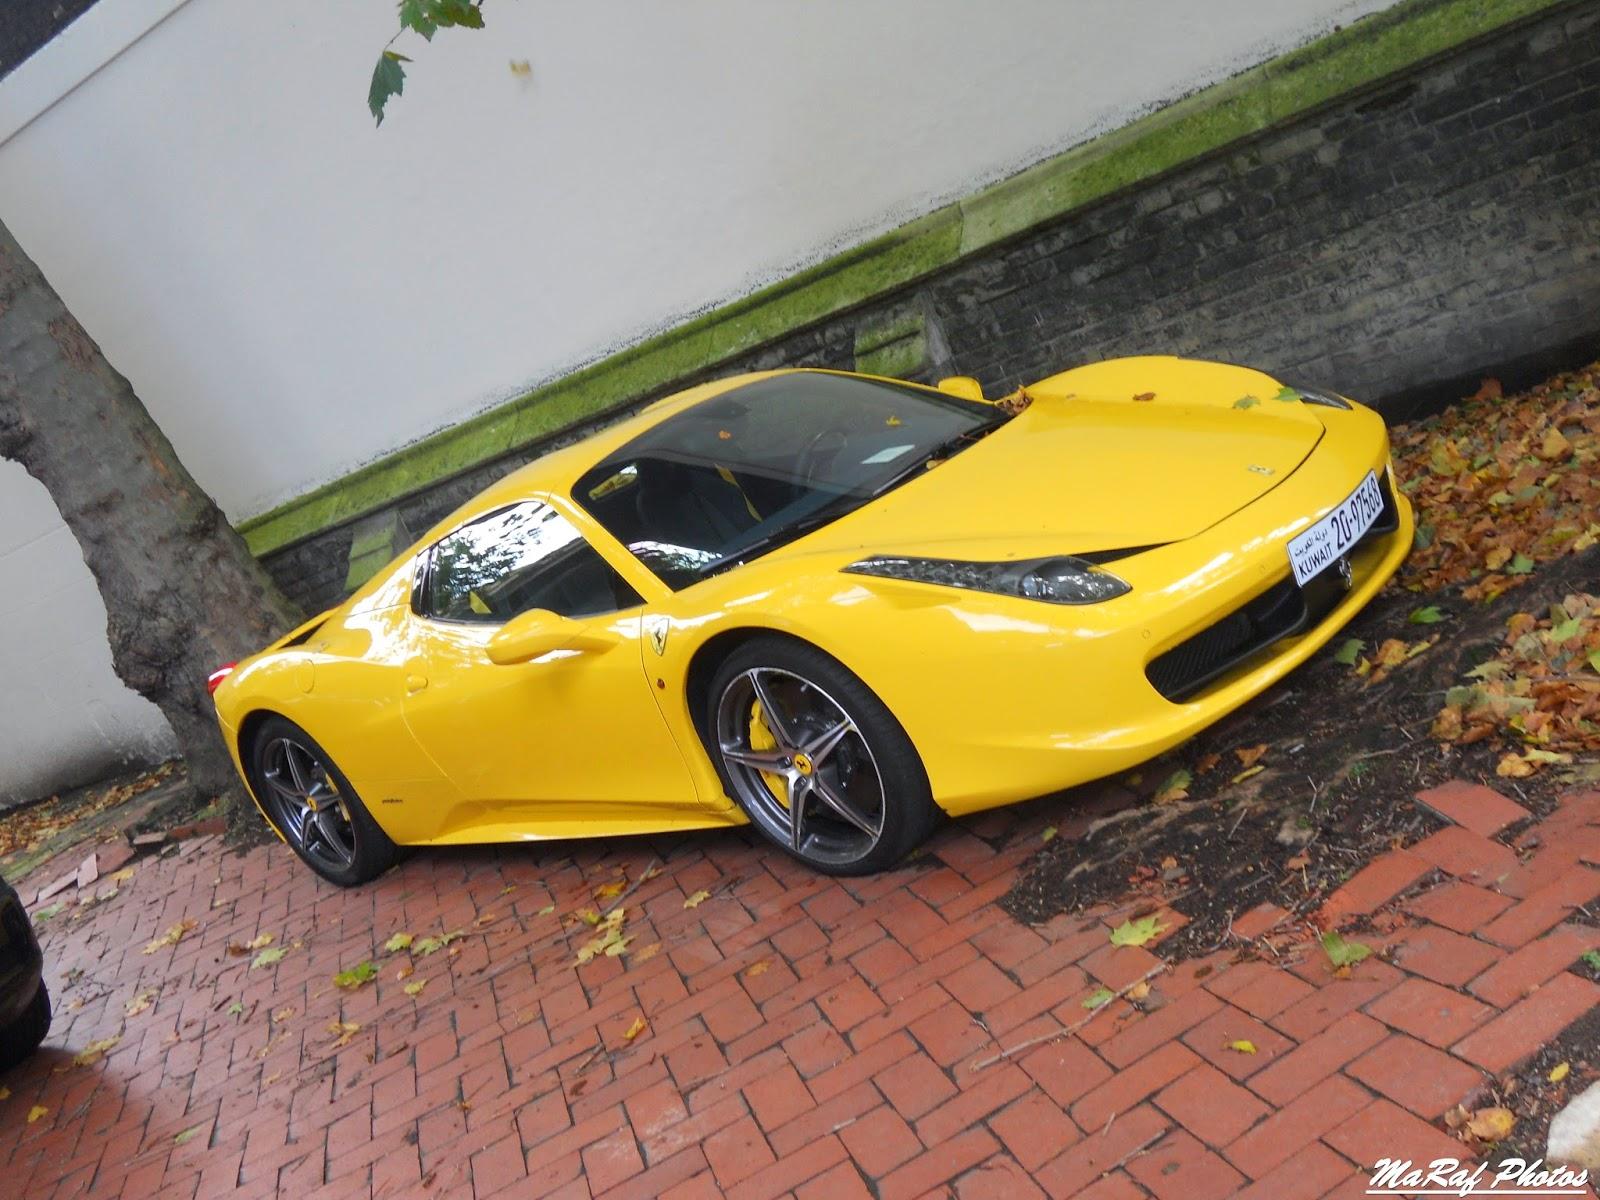 In Fact, Itu0027s Not Difficult Meet Various Rolls Royce, Ferrari Or  Lamborghini From Dubai, Qatar Or Kuwait. This 458 Spider In Classic Ferrari  Yellow Comes ...